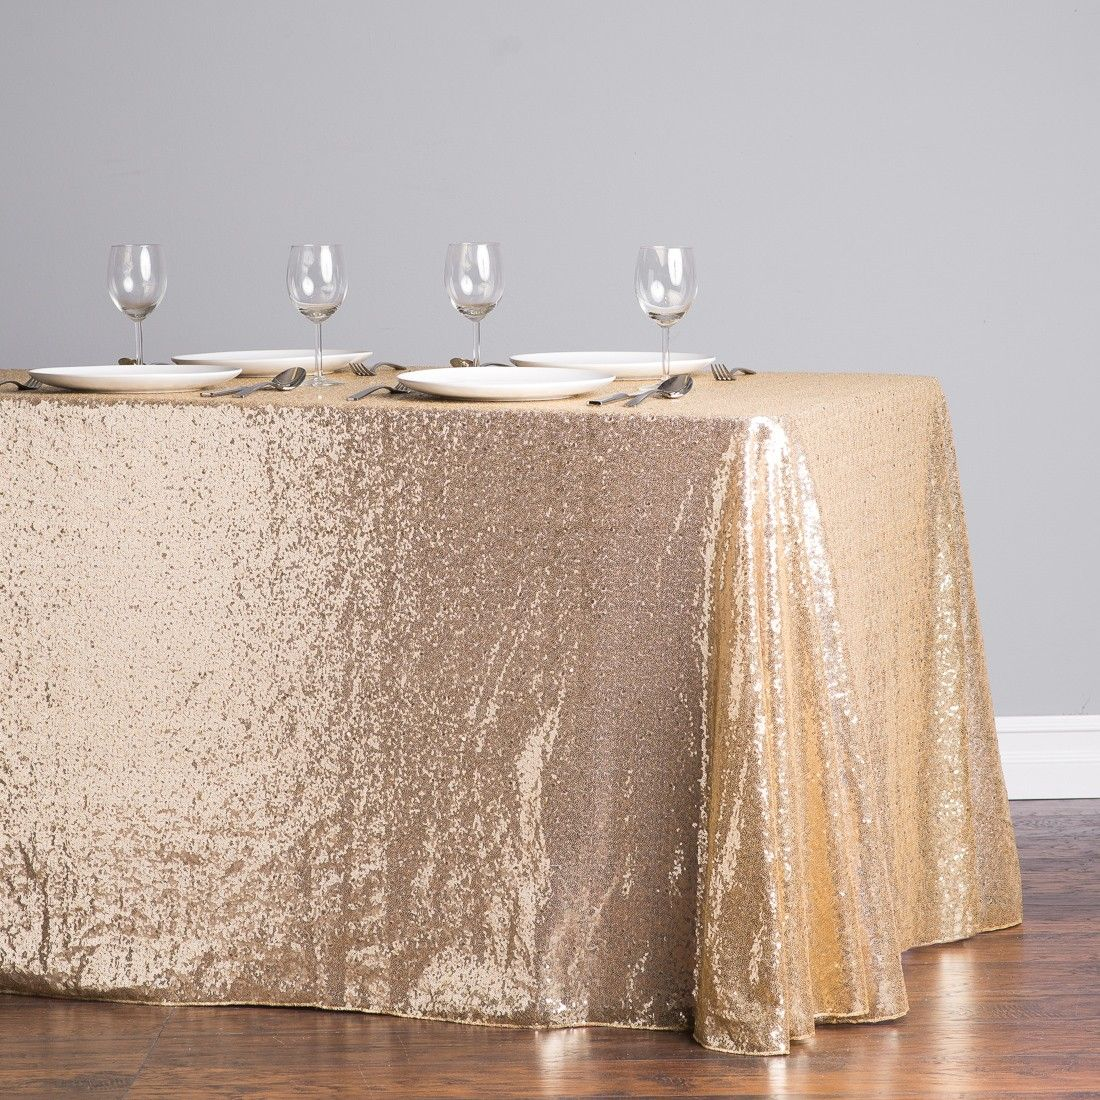 Rectangular Cotton Vintage Royalty Tablecloth Navy Blue U0026 White